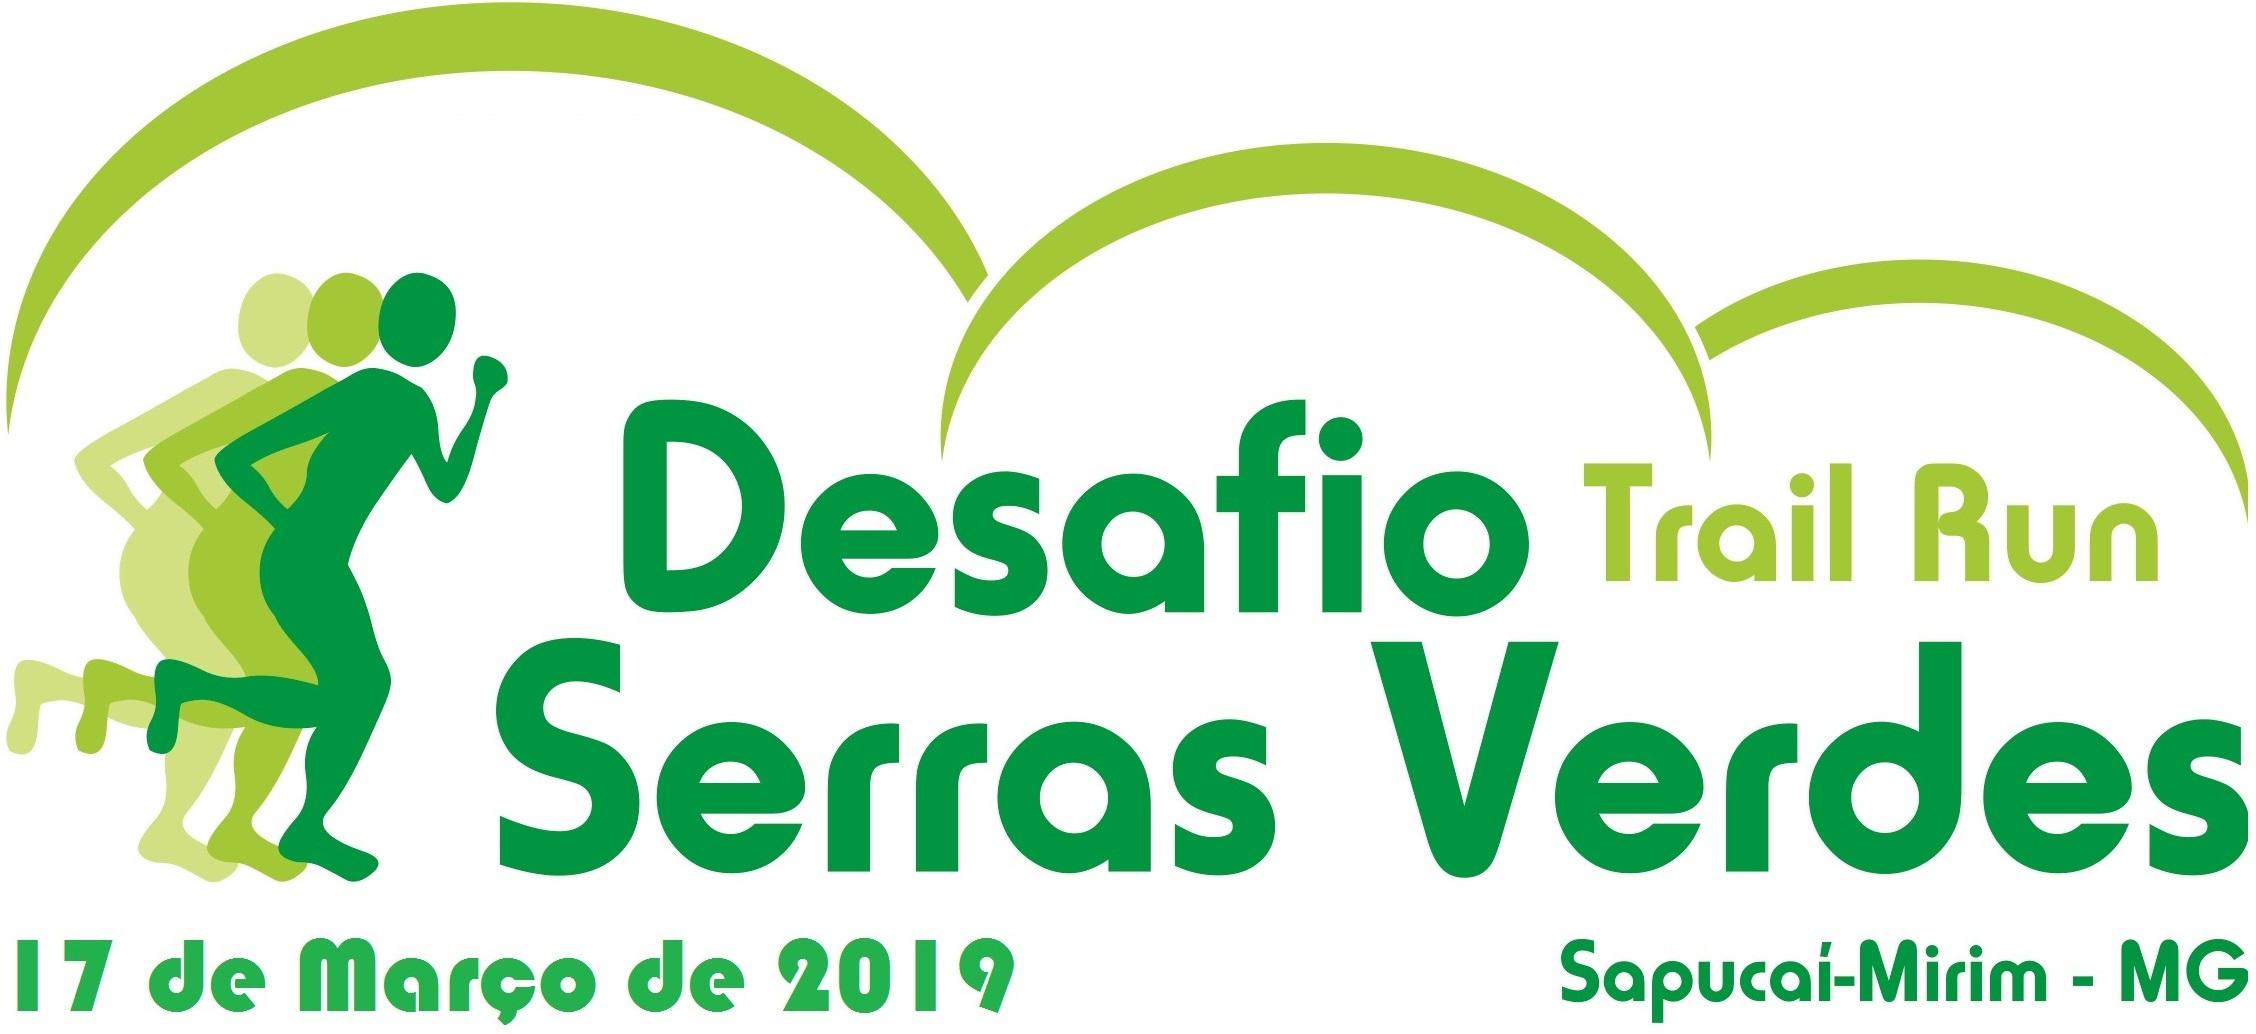 Desafio Serras Verdes 2019